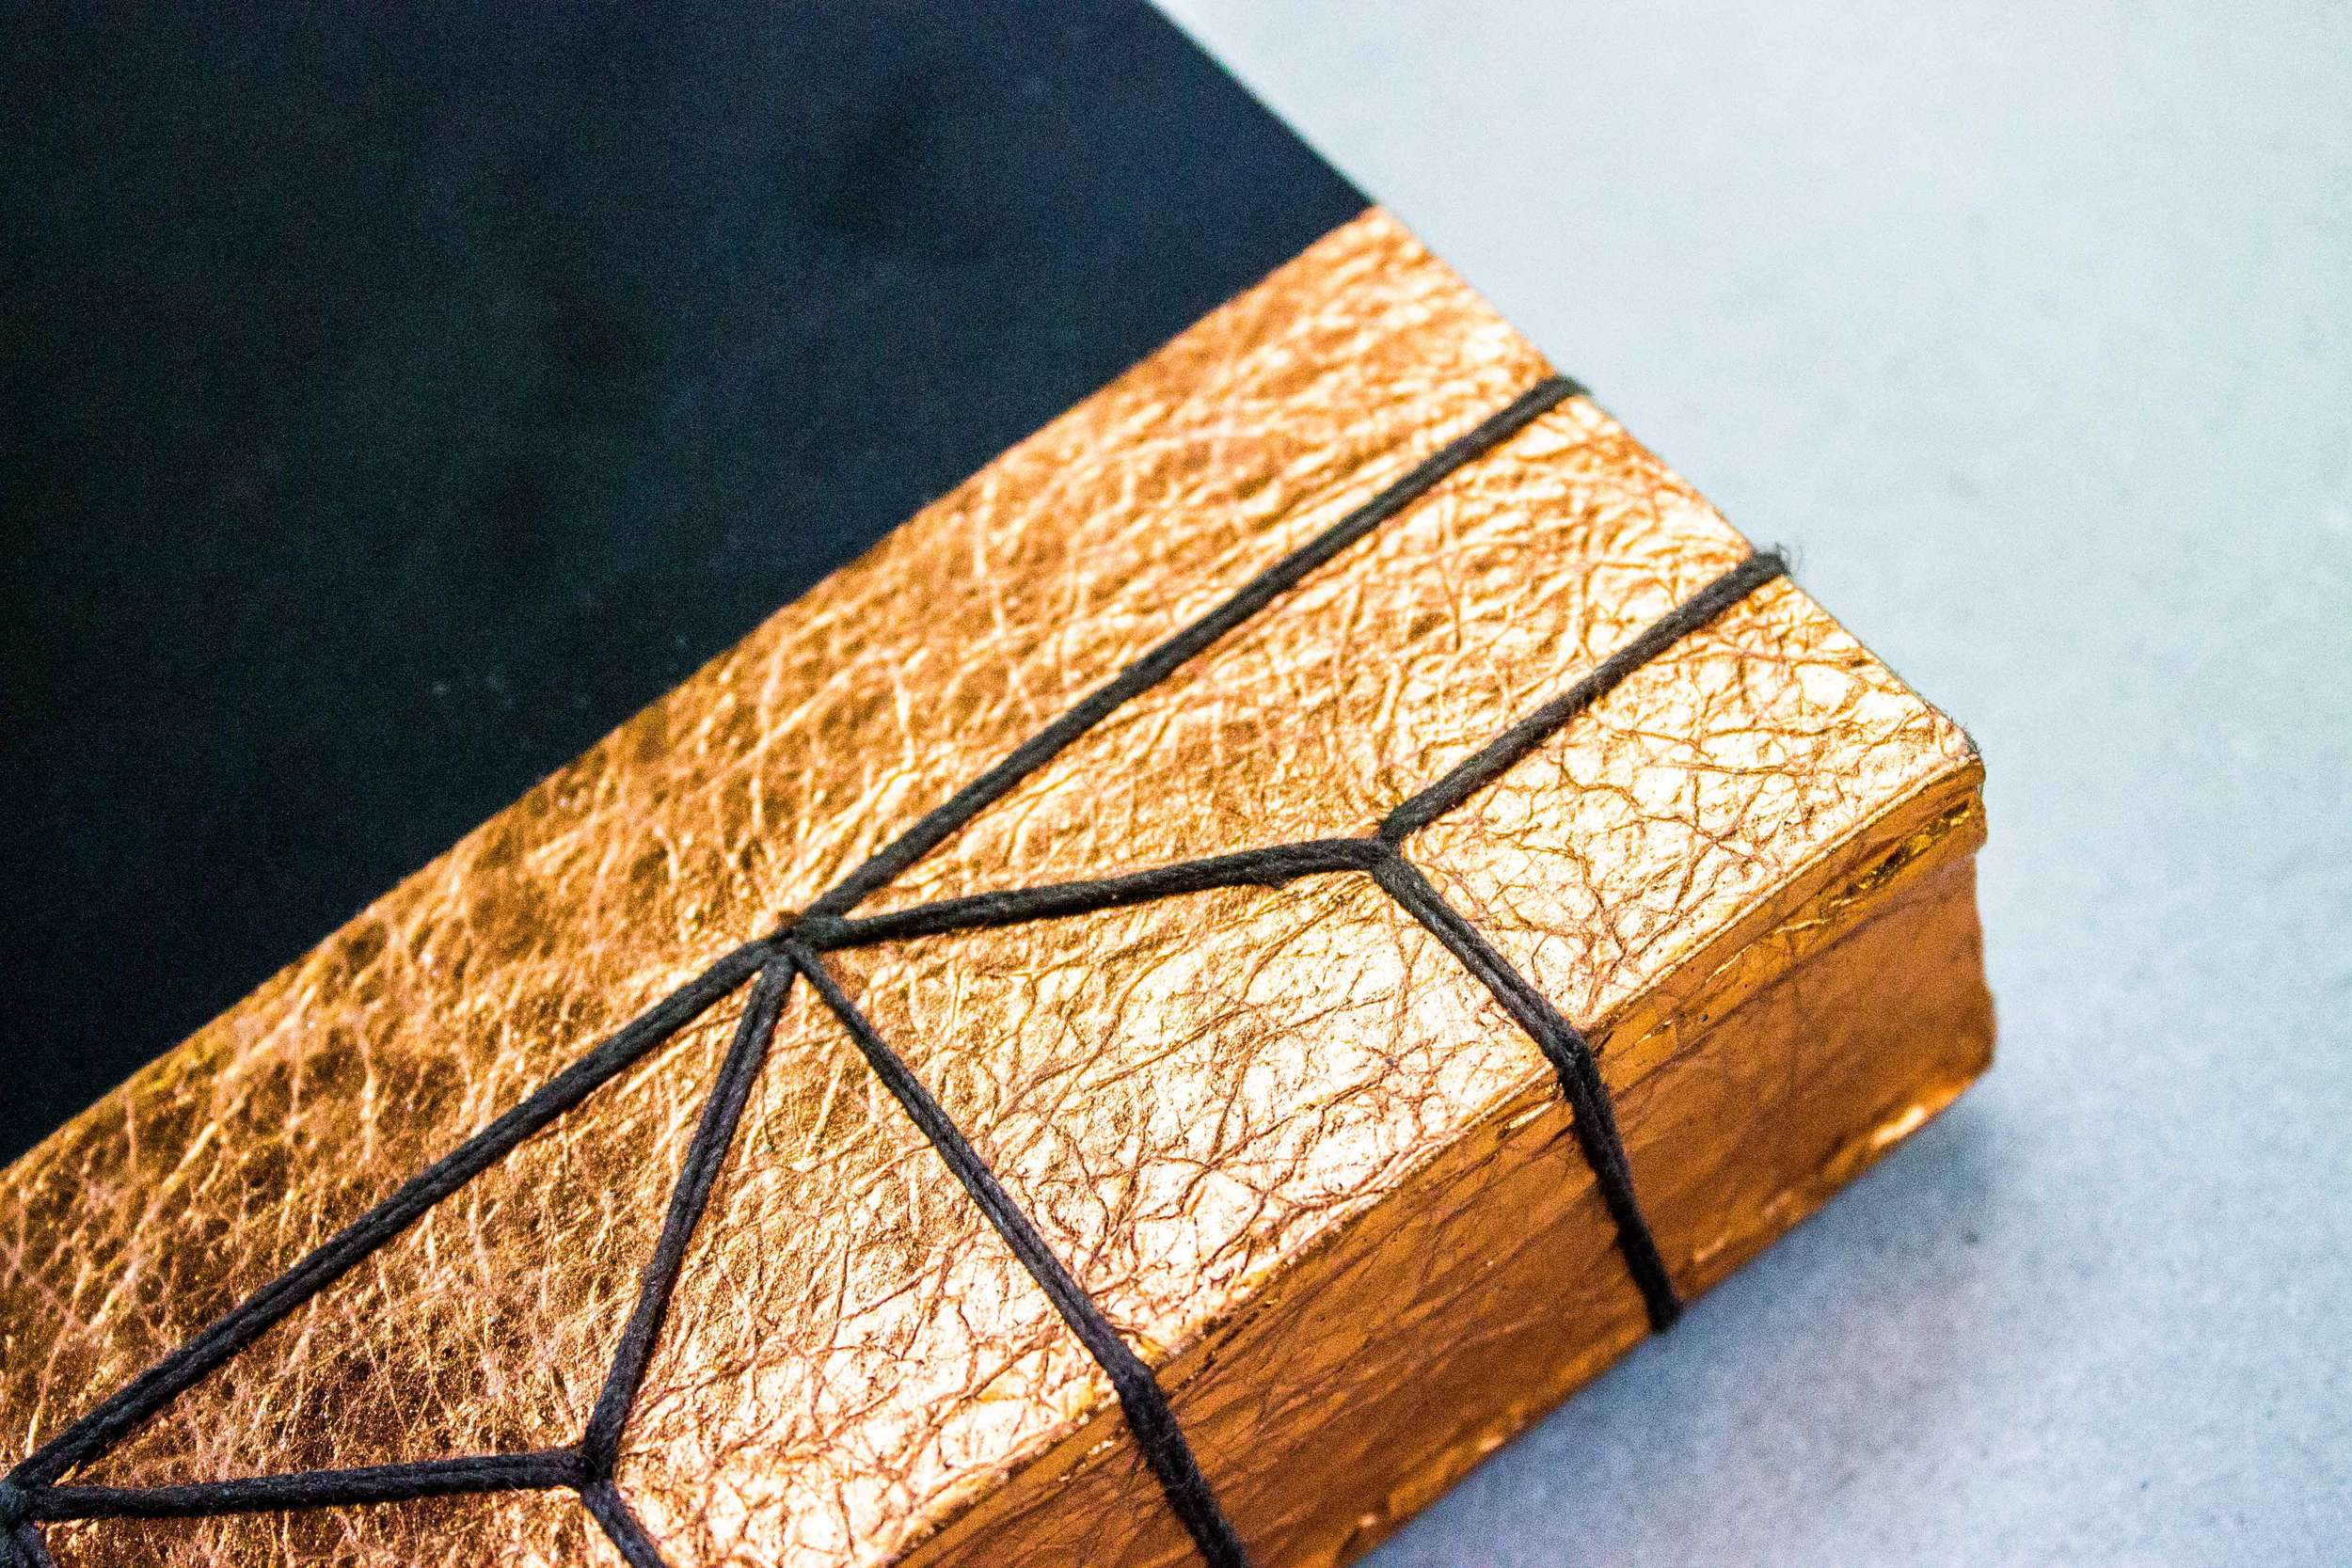 Japanese sewn book